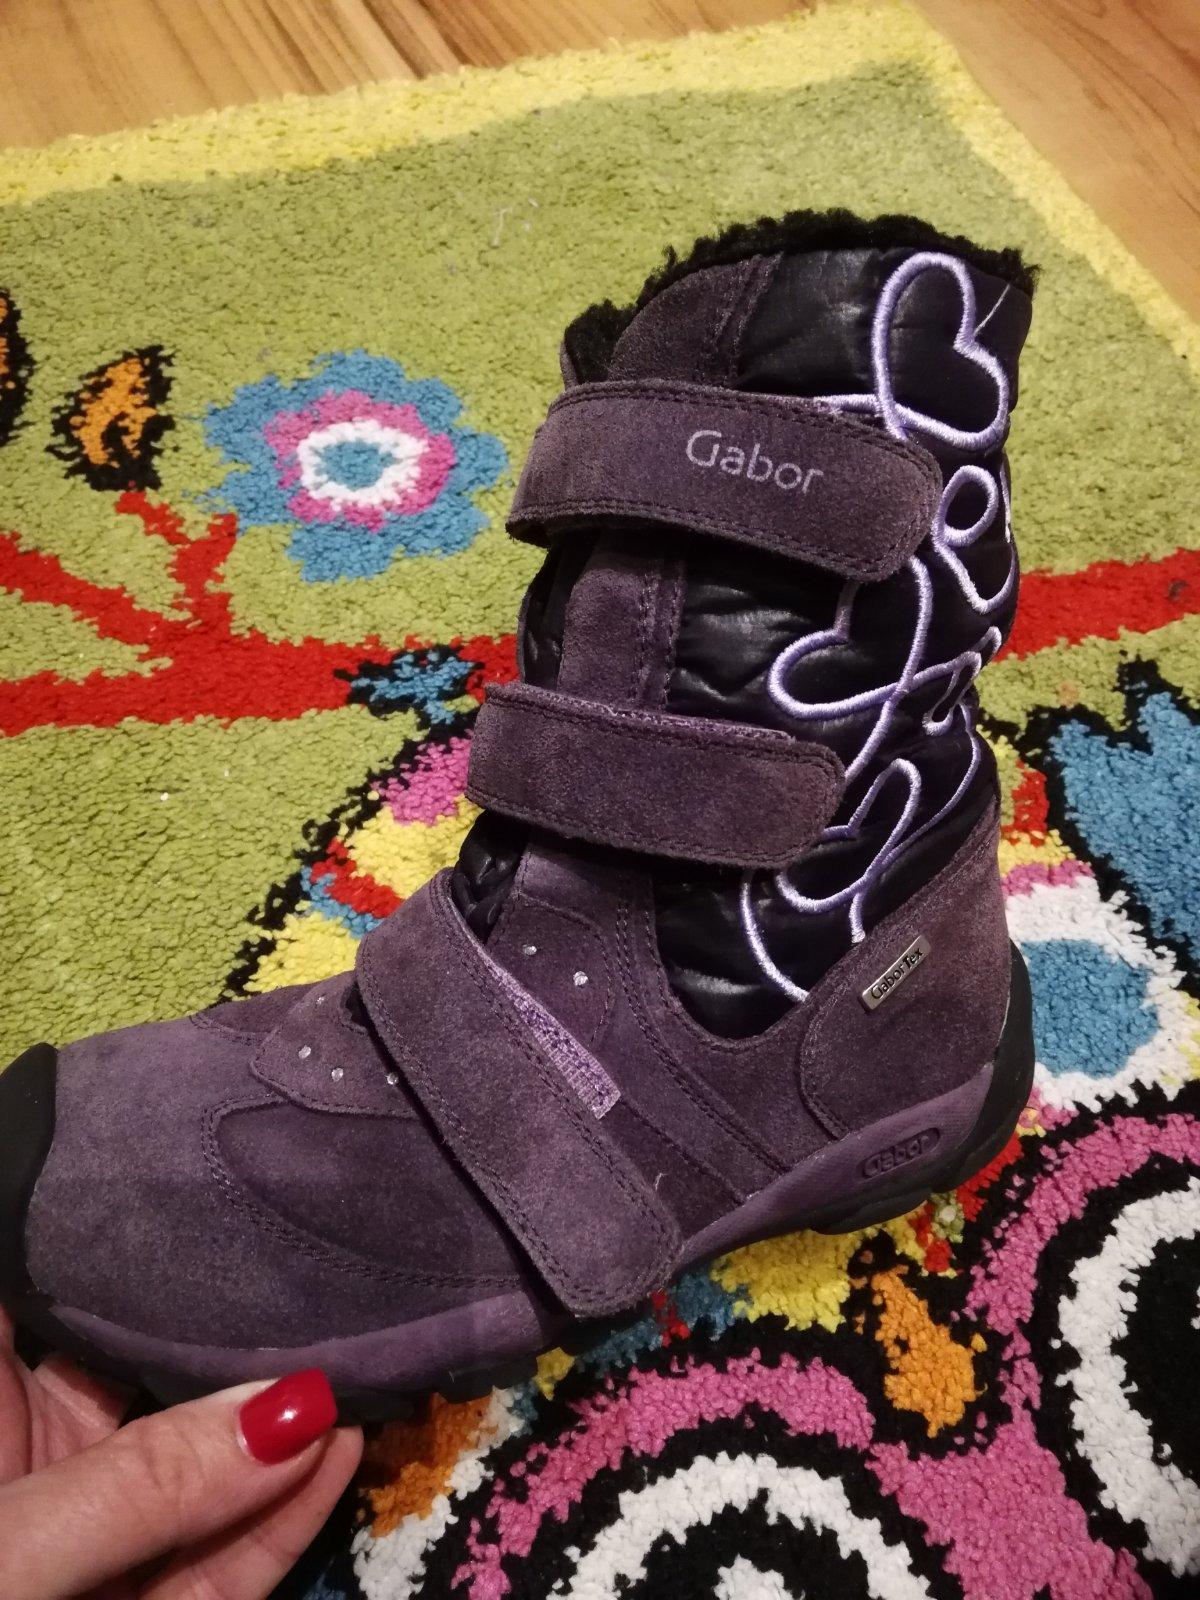 b30a402dfc Kvalitné zimné topánky zn. gabor